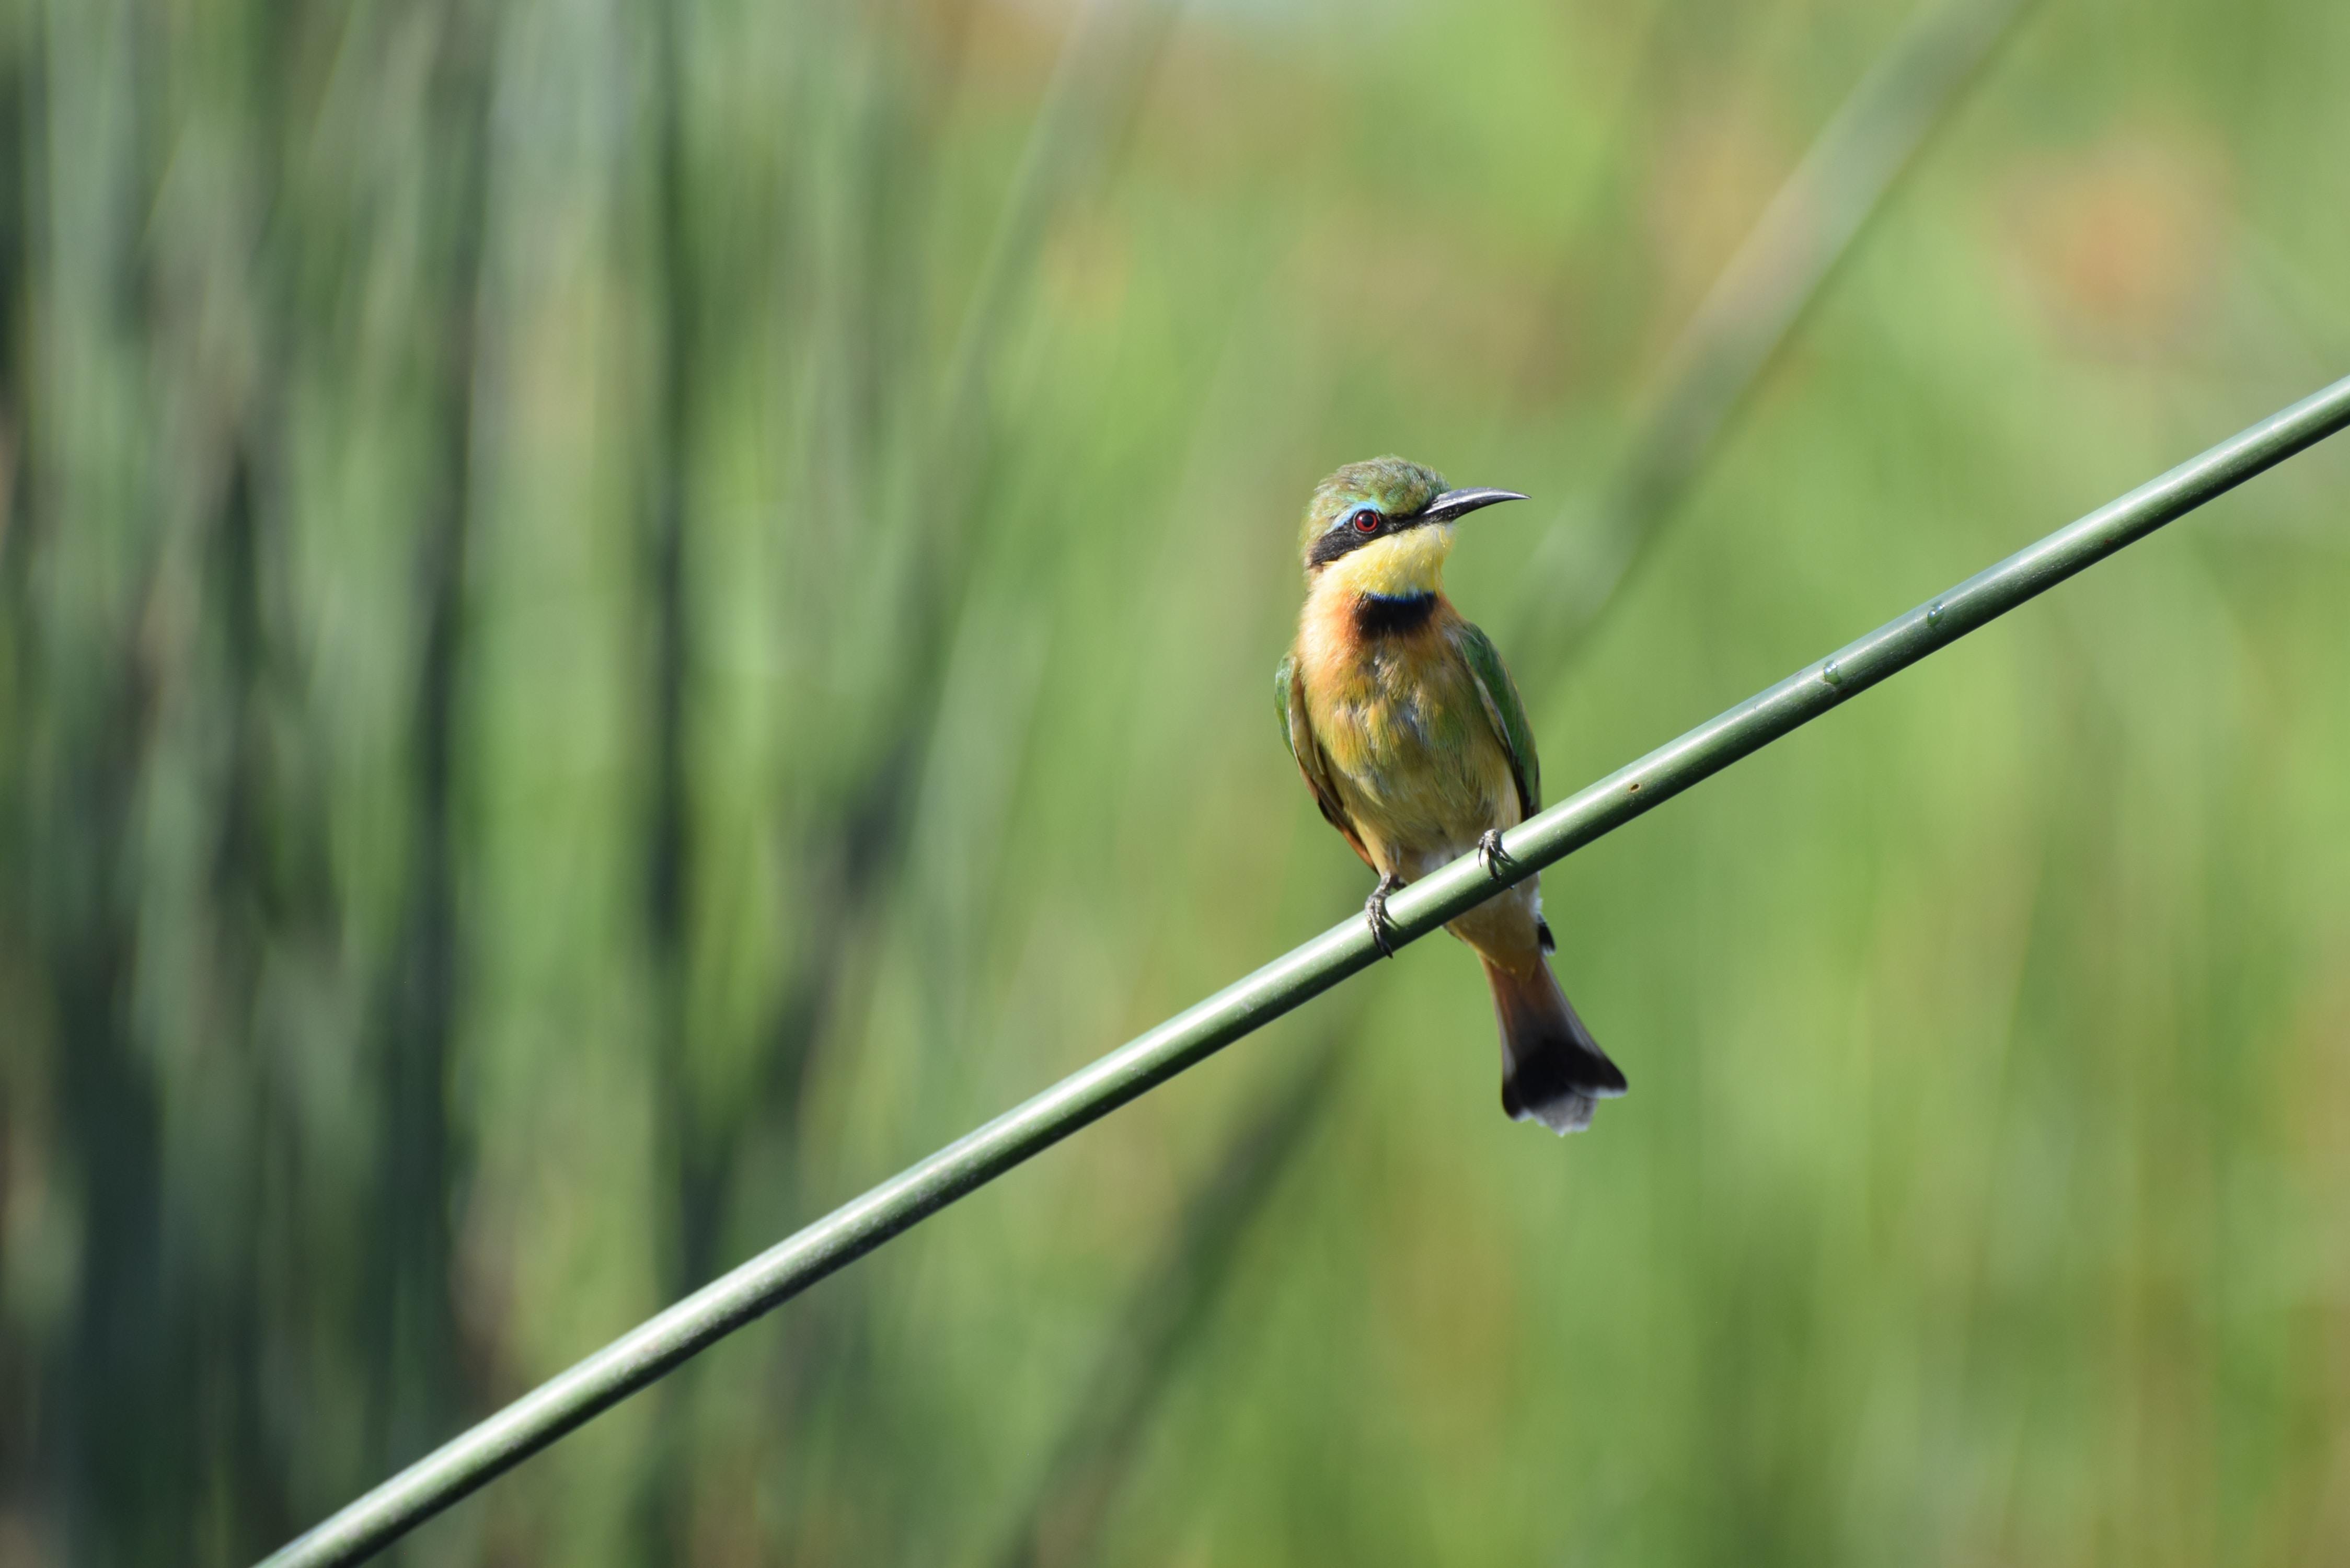 yellow belly long beaked bird on black bamboo stick